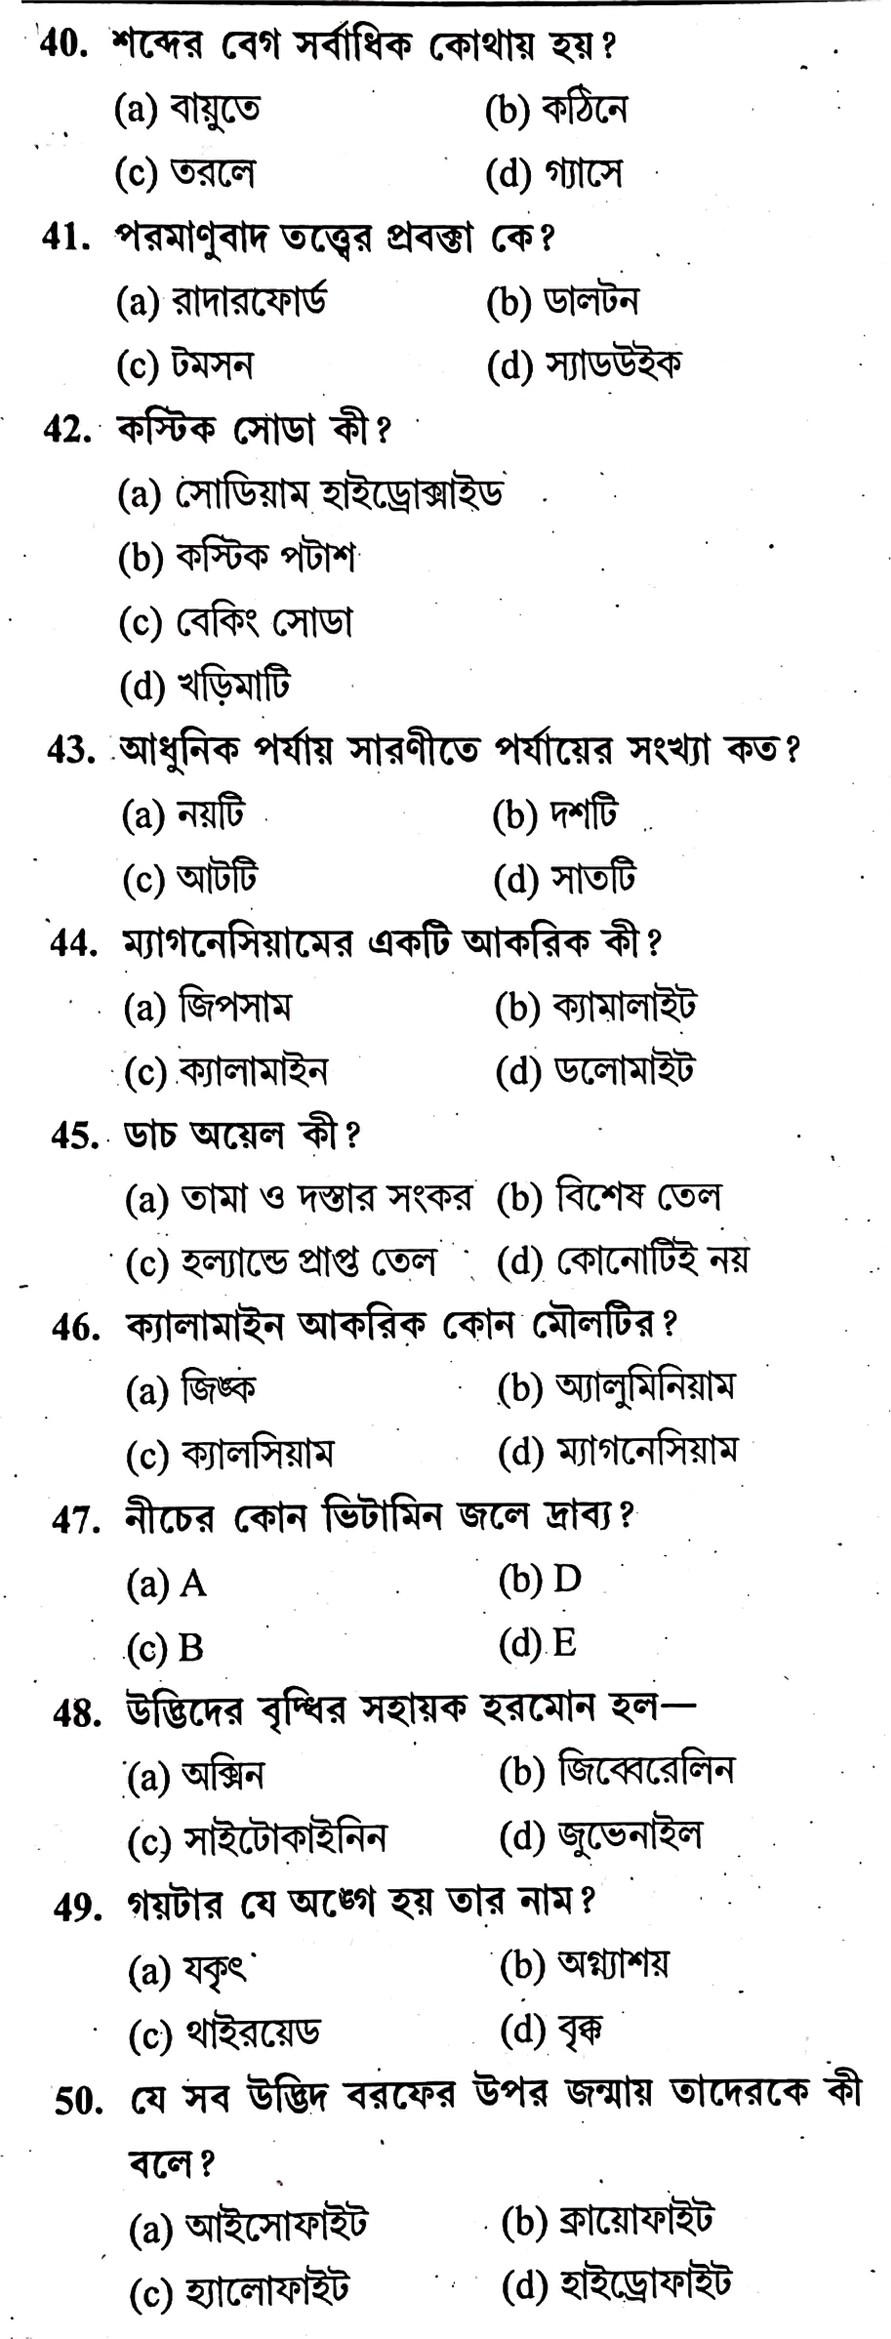 West Bengal Police Constable Preliminary Practice Set - 14 In Bengali || পশ্চিমবঙ্গ পুলিশ কনস্টেবল প্রিলিমিনারী প্র্যাকটিস সেট -১৪ - WBCS Notebook